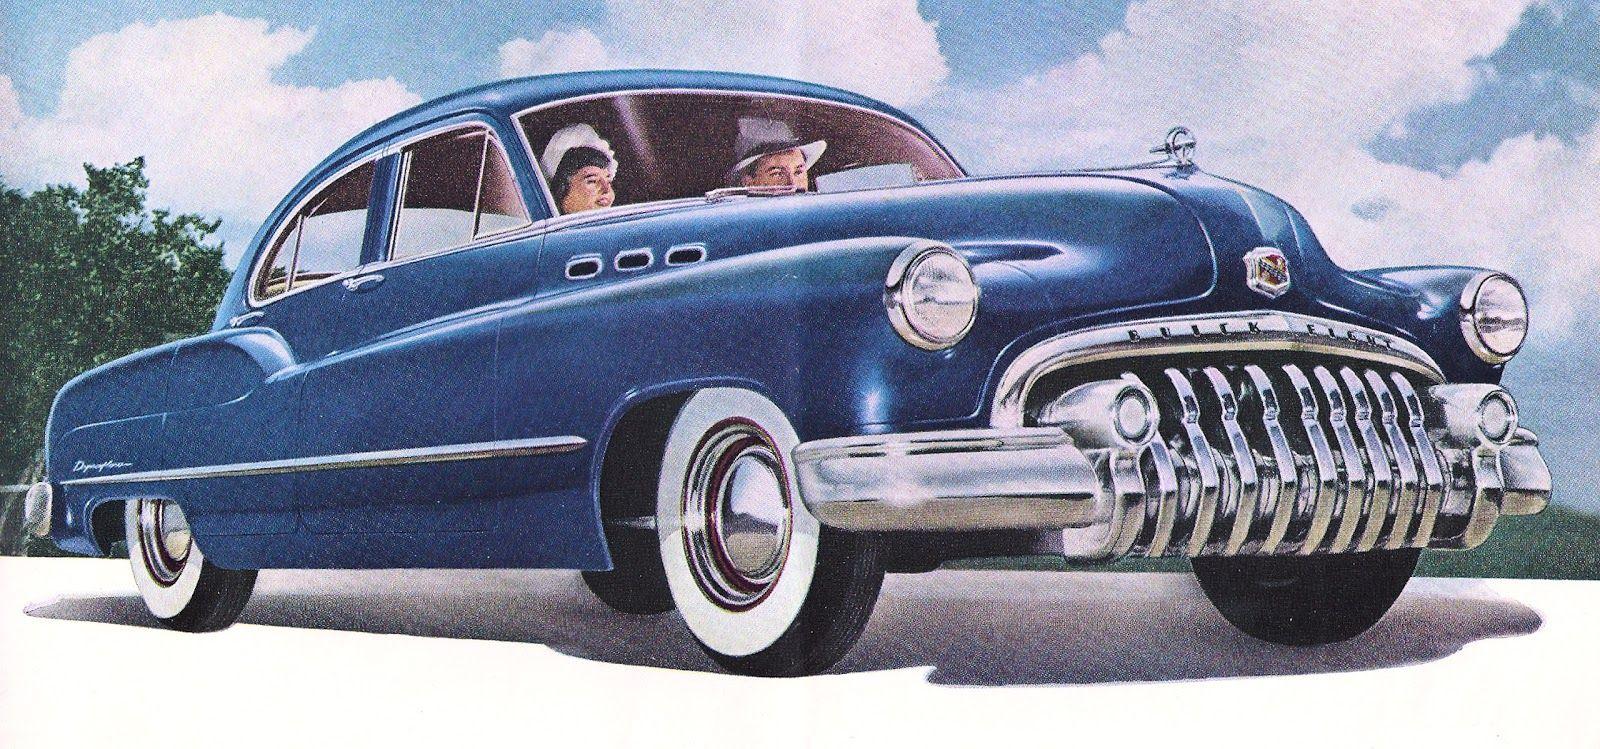 Rare Classic 1950s Cars.